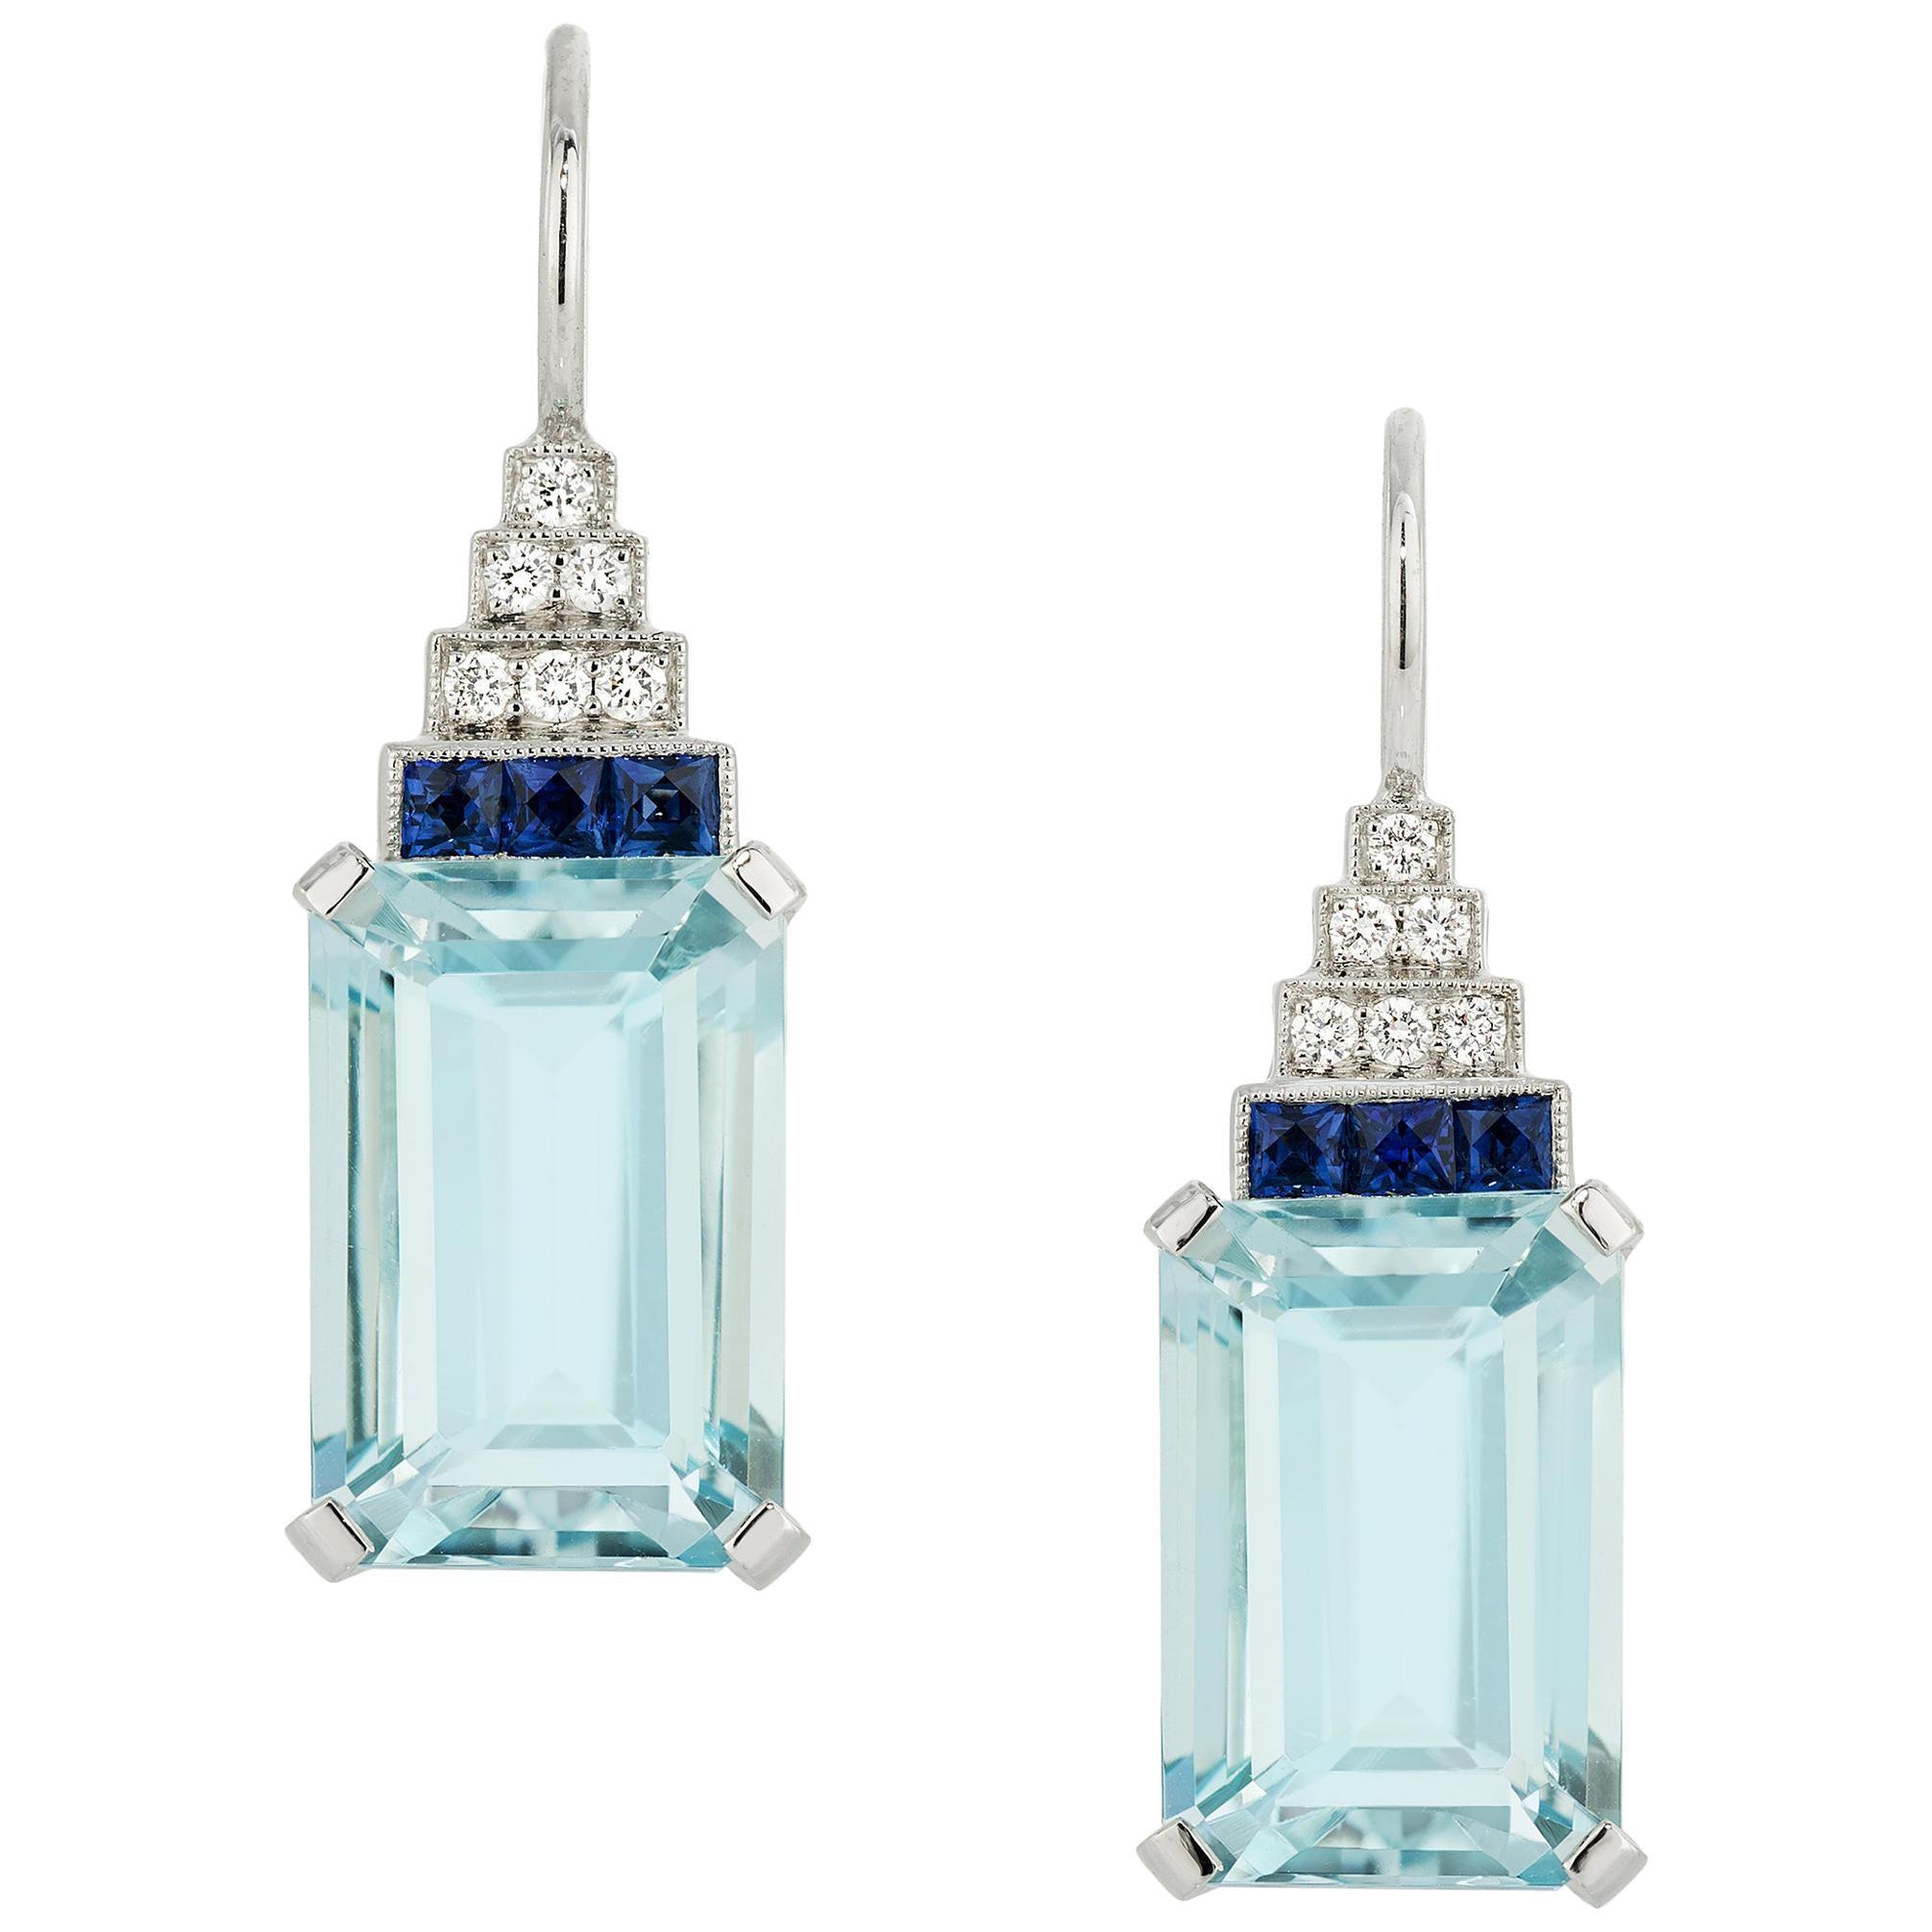 8.81 Carat Emerald Cut Aquamarine, French Cut Sapphire, and Diamond Earrings